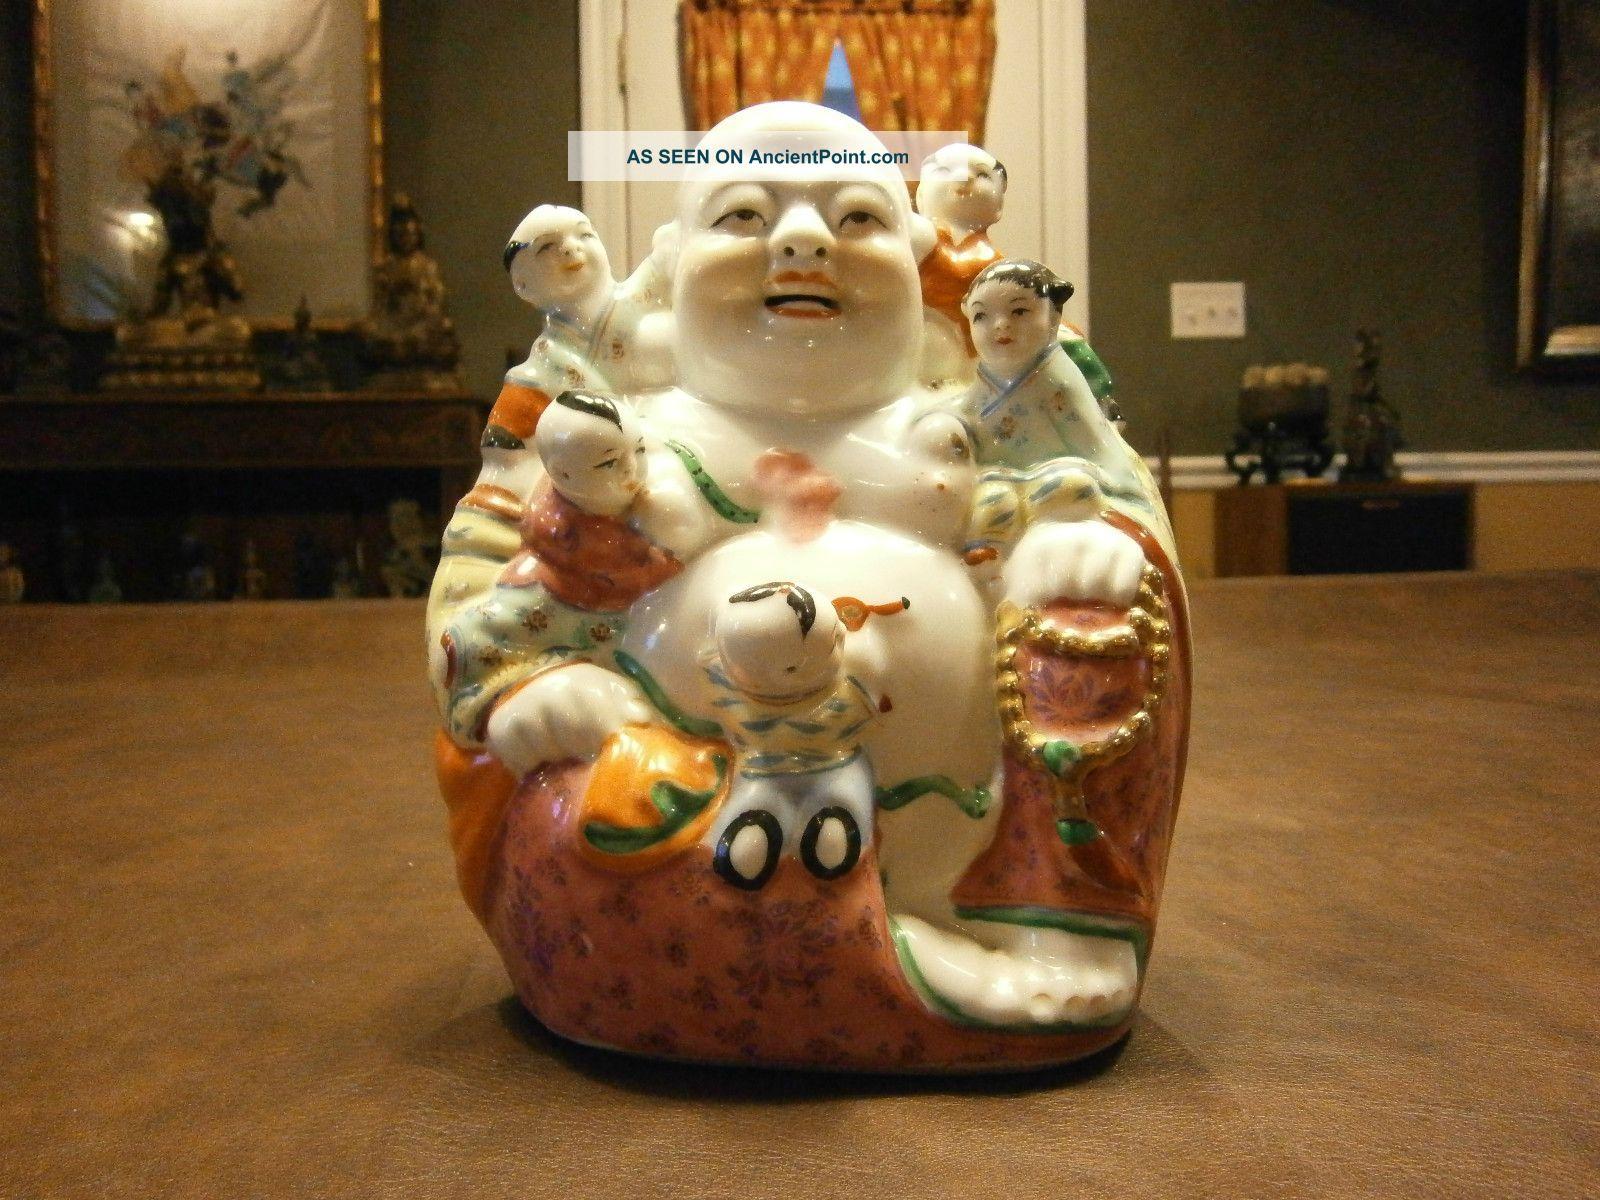 Vintage/old Ho Tai Signed Buddha Statue.  Playful Peacful Presence Buddha photo